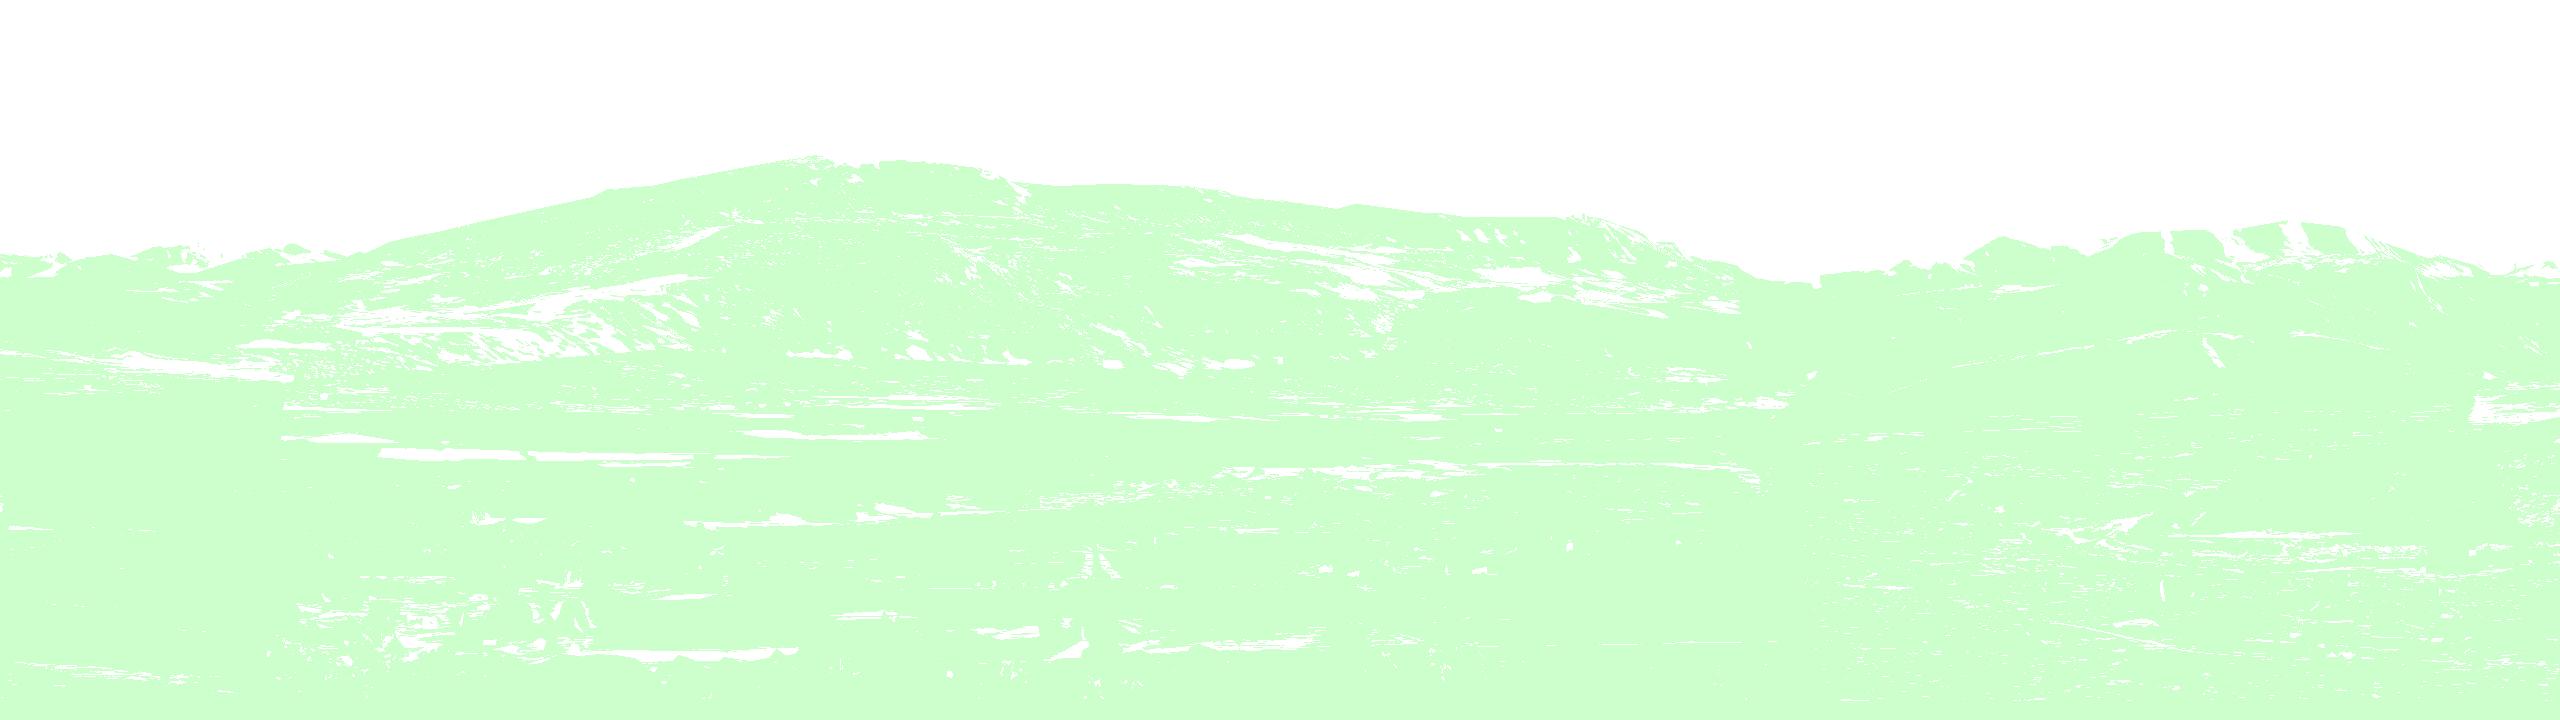 promenade_7